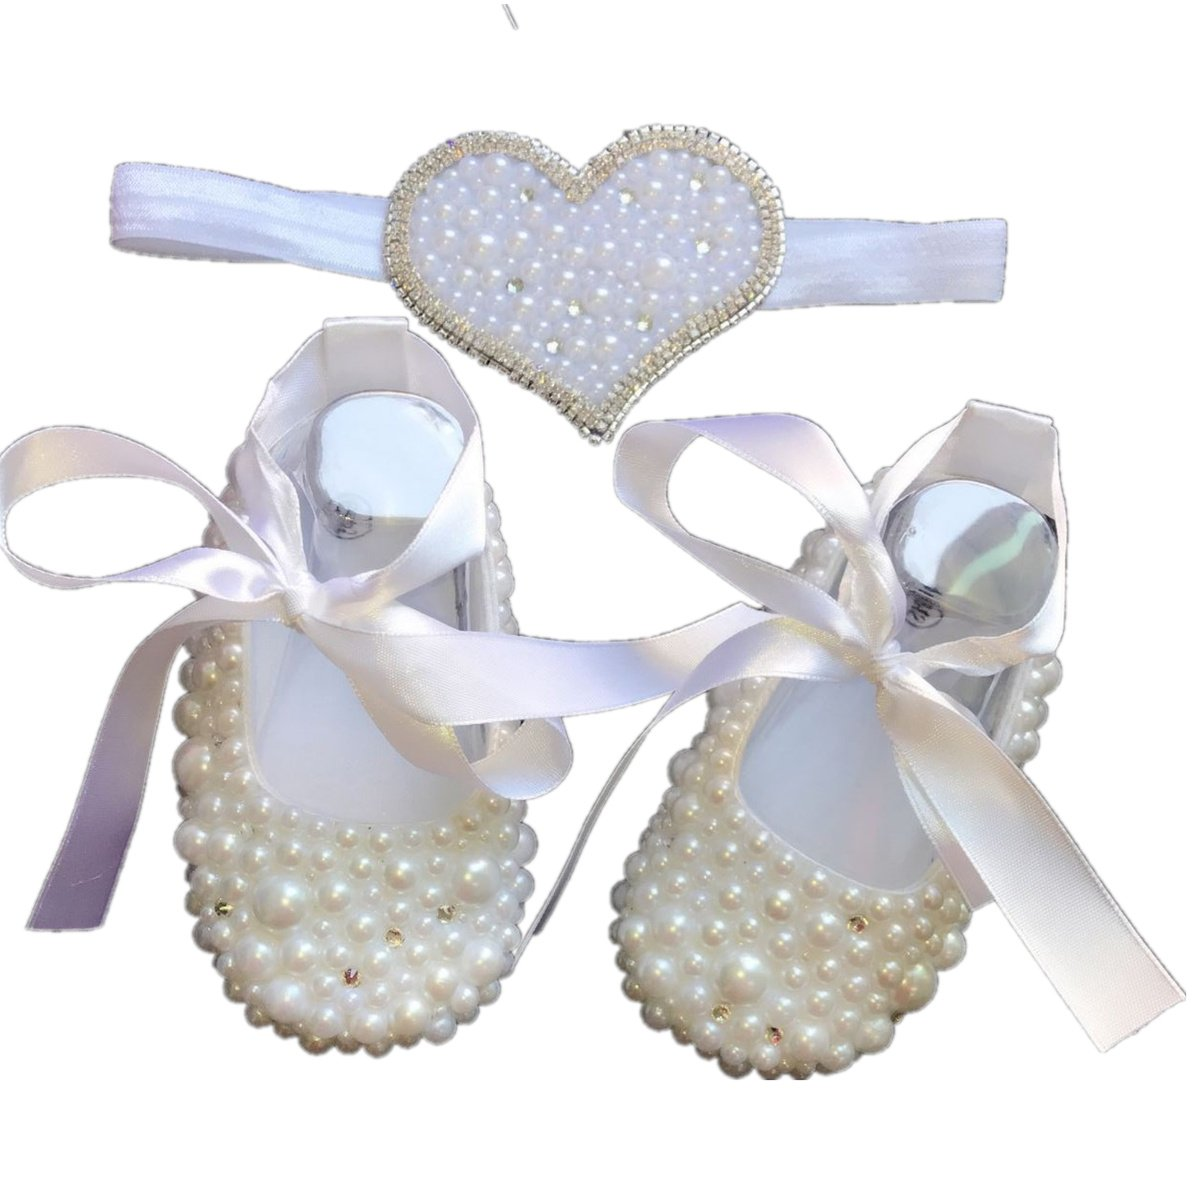 Dollbling ADORABLE Handmade Christening White Pearls Rhinestones Bottom Baby Fantasy Crib Shoes and Pearl Heart Headband set, Baby Keepsakes Birthday Gifts (0-6 Months)